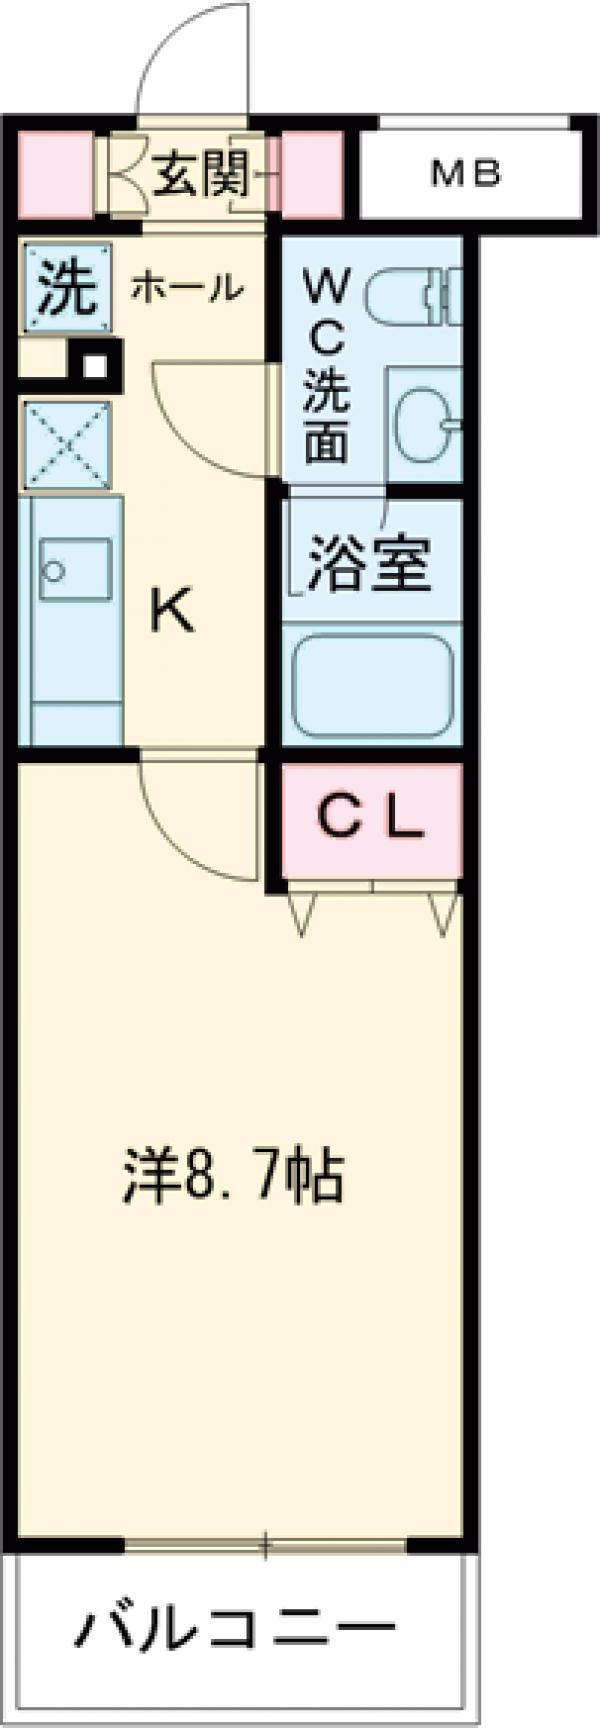 AZEST西高島平・304号室の間取り